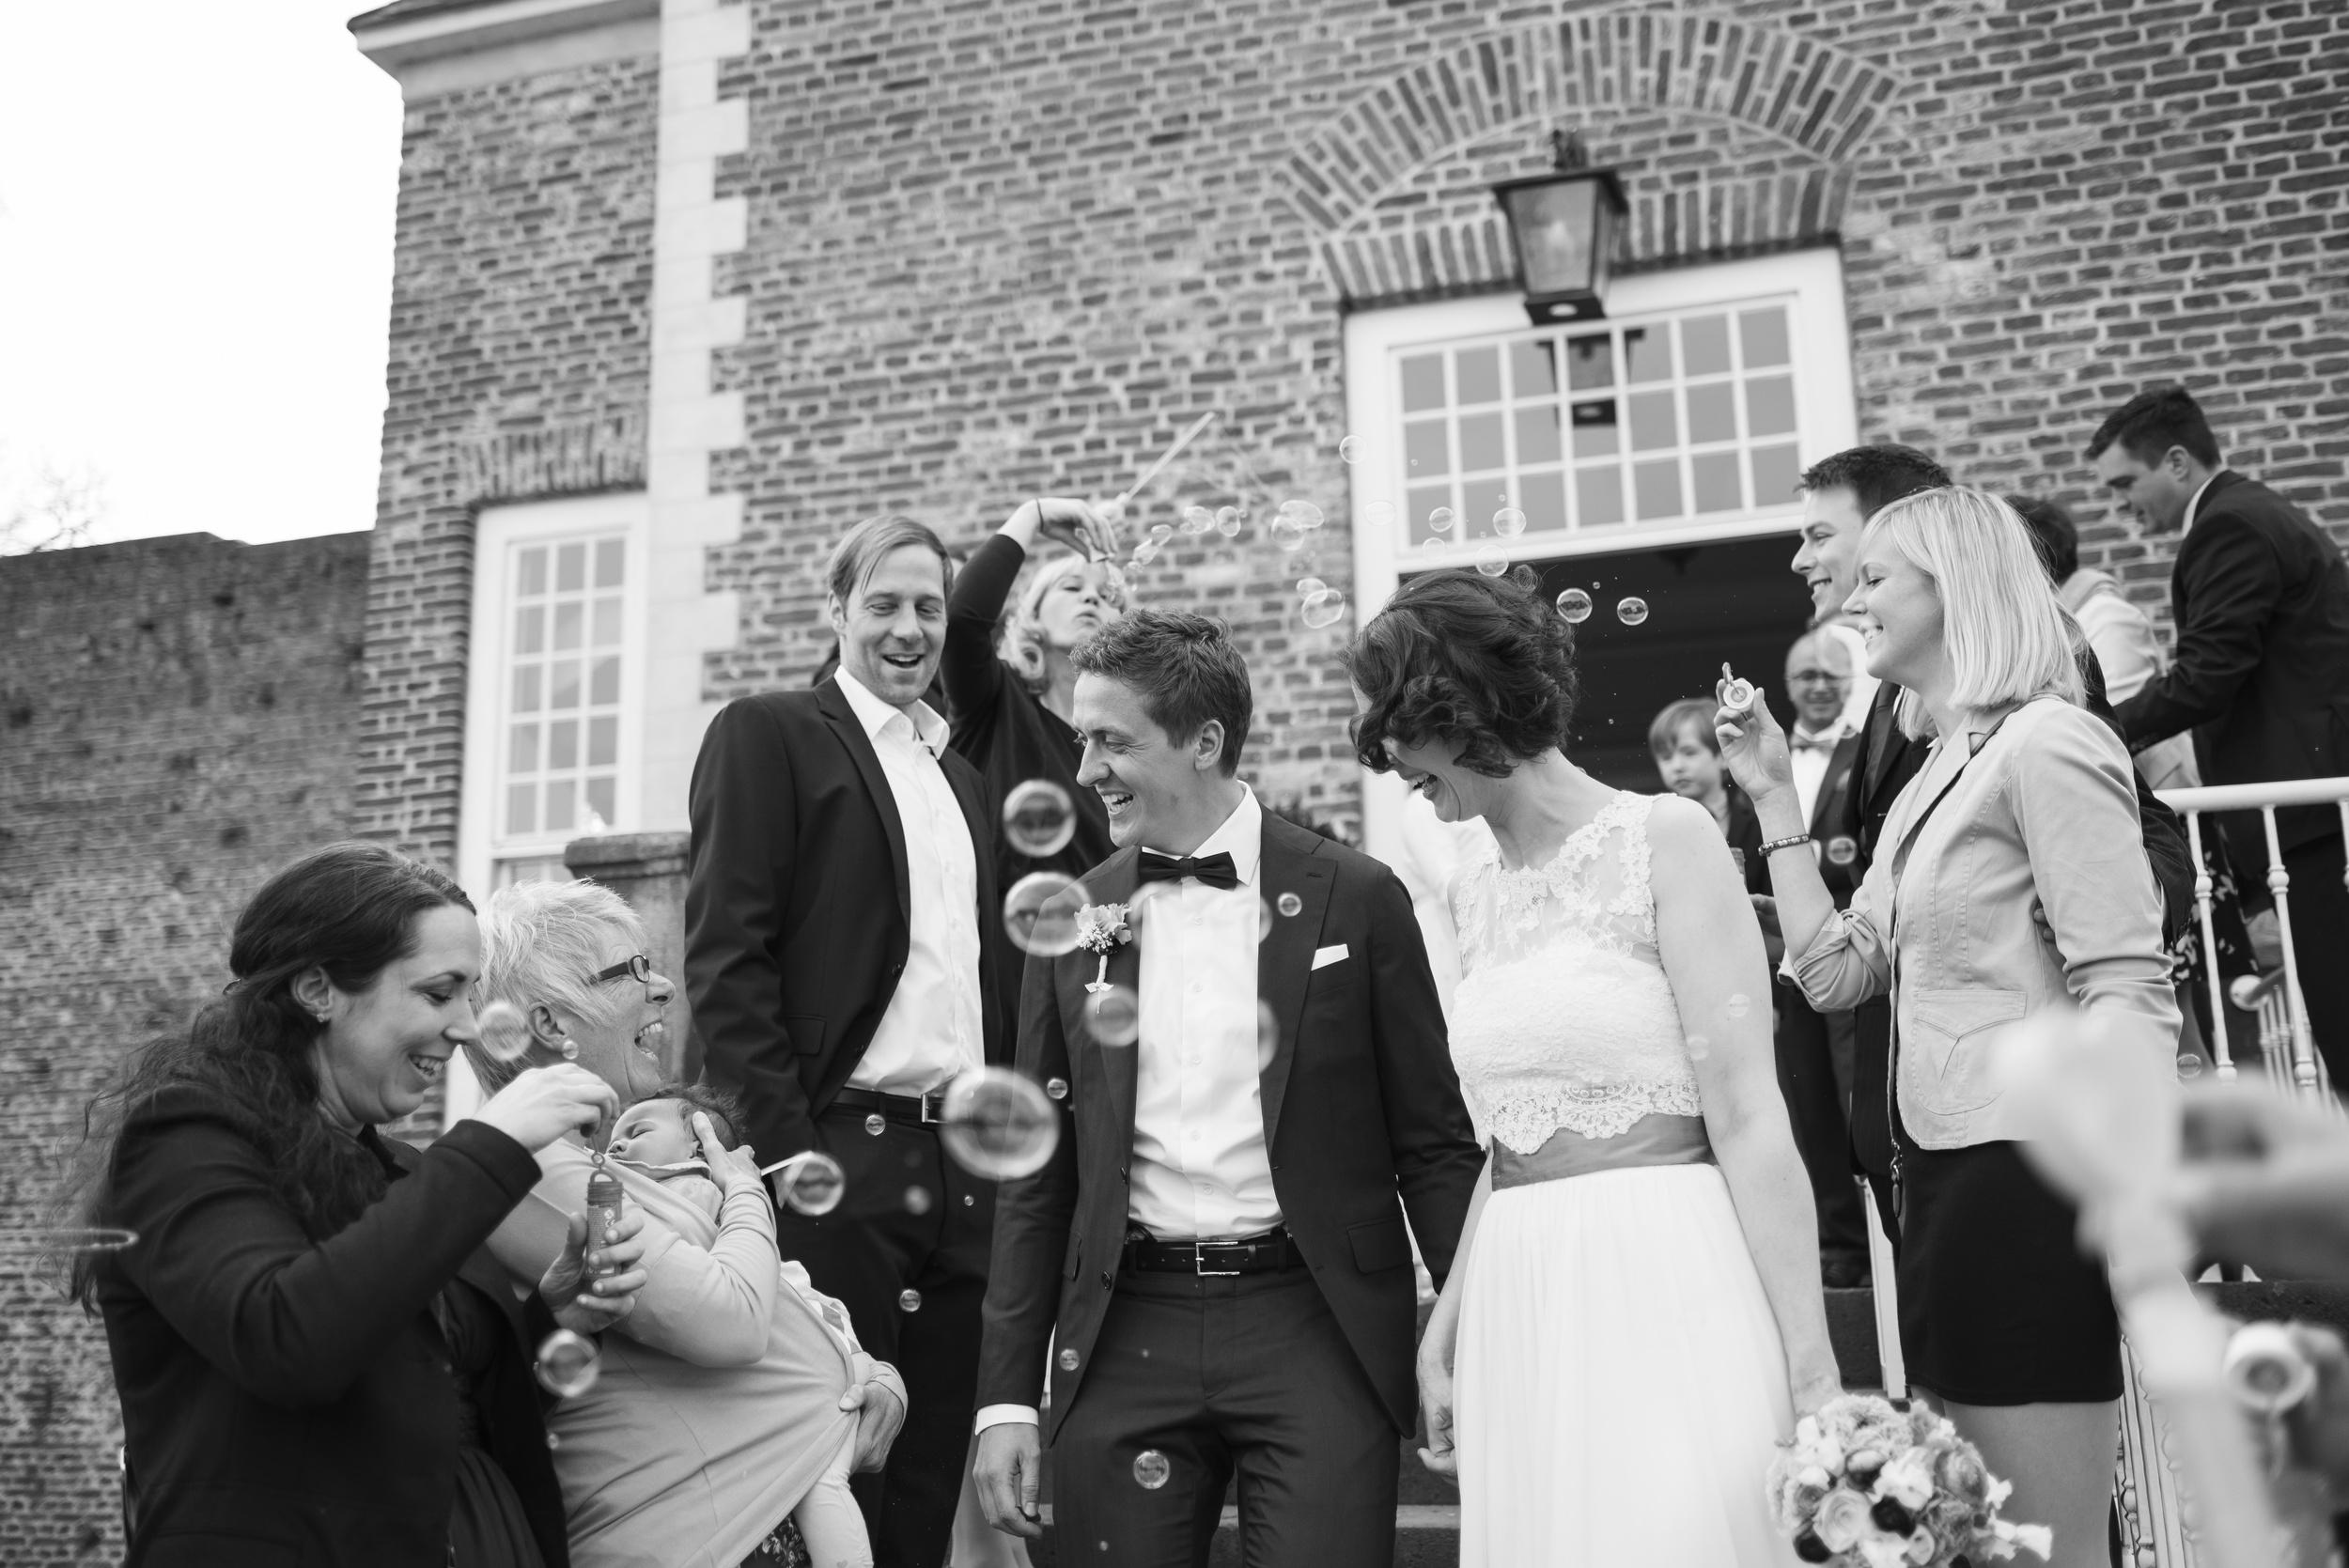 Hochzeitsfotograf-Schlossruine-Hertefeld-Weeze-090.jpg